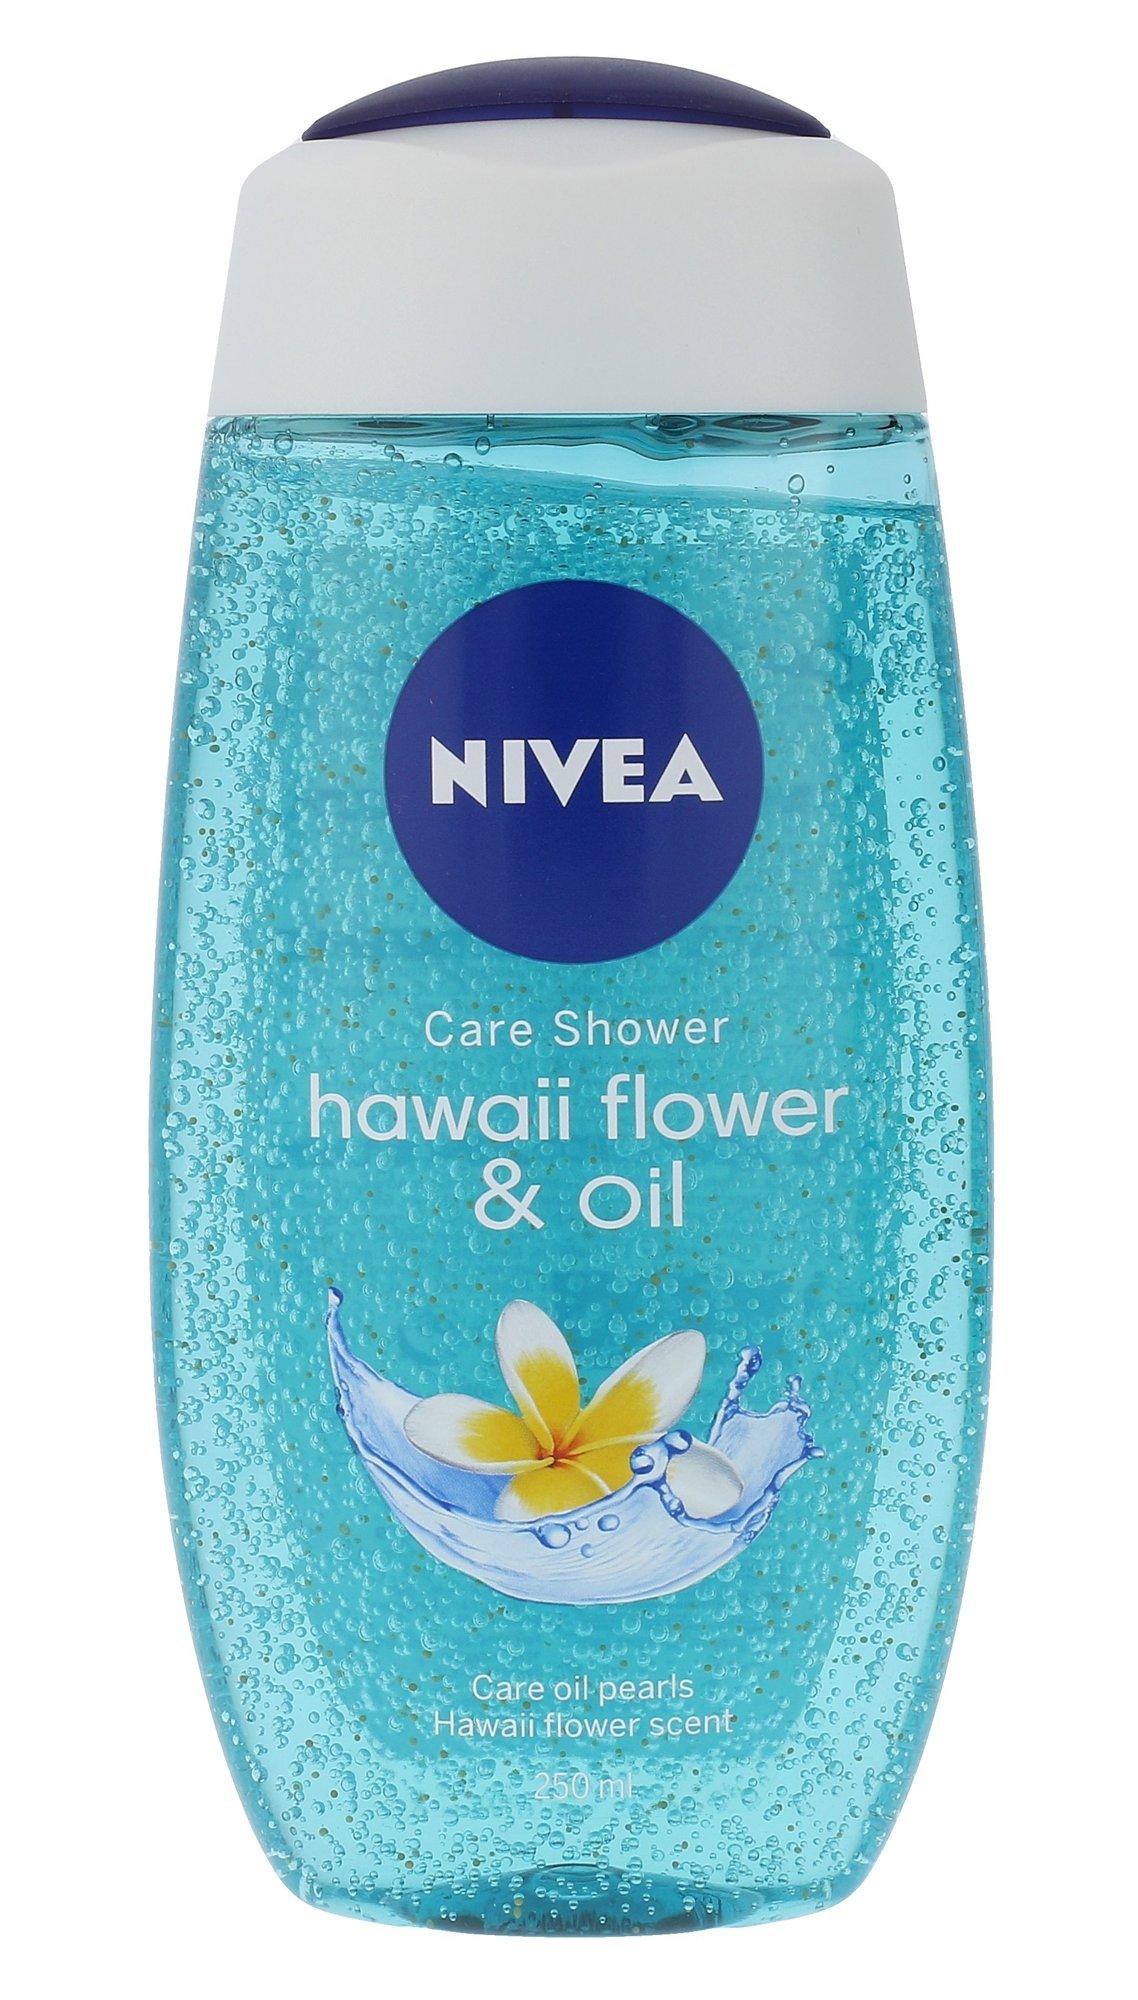 Nivea Hawaii Flower & Oil Shower Gel Cosmetic 250ml